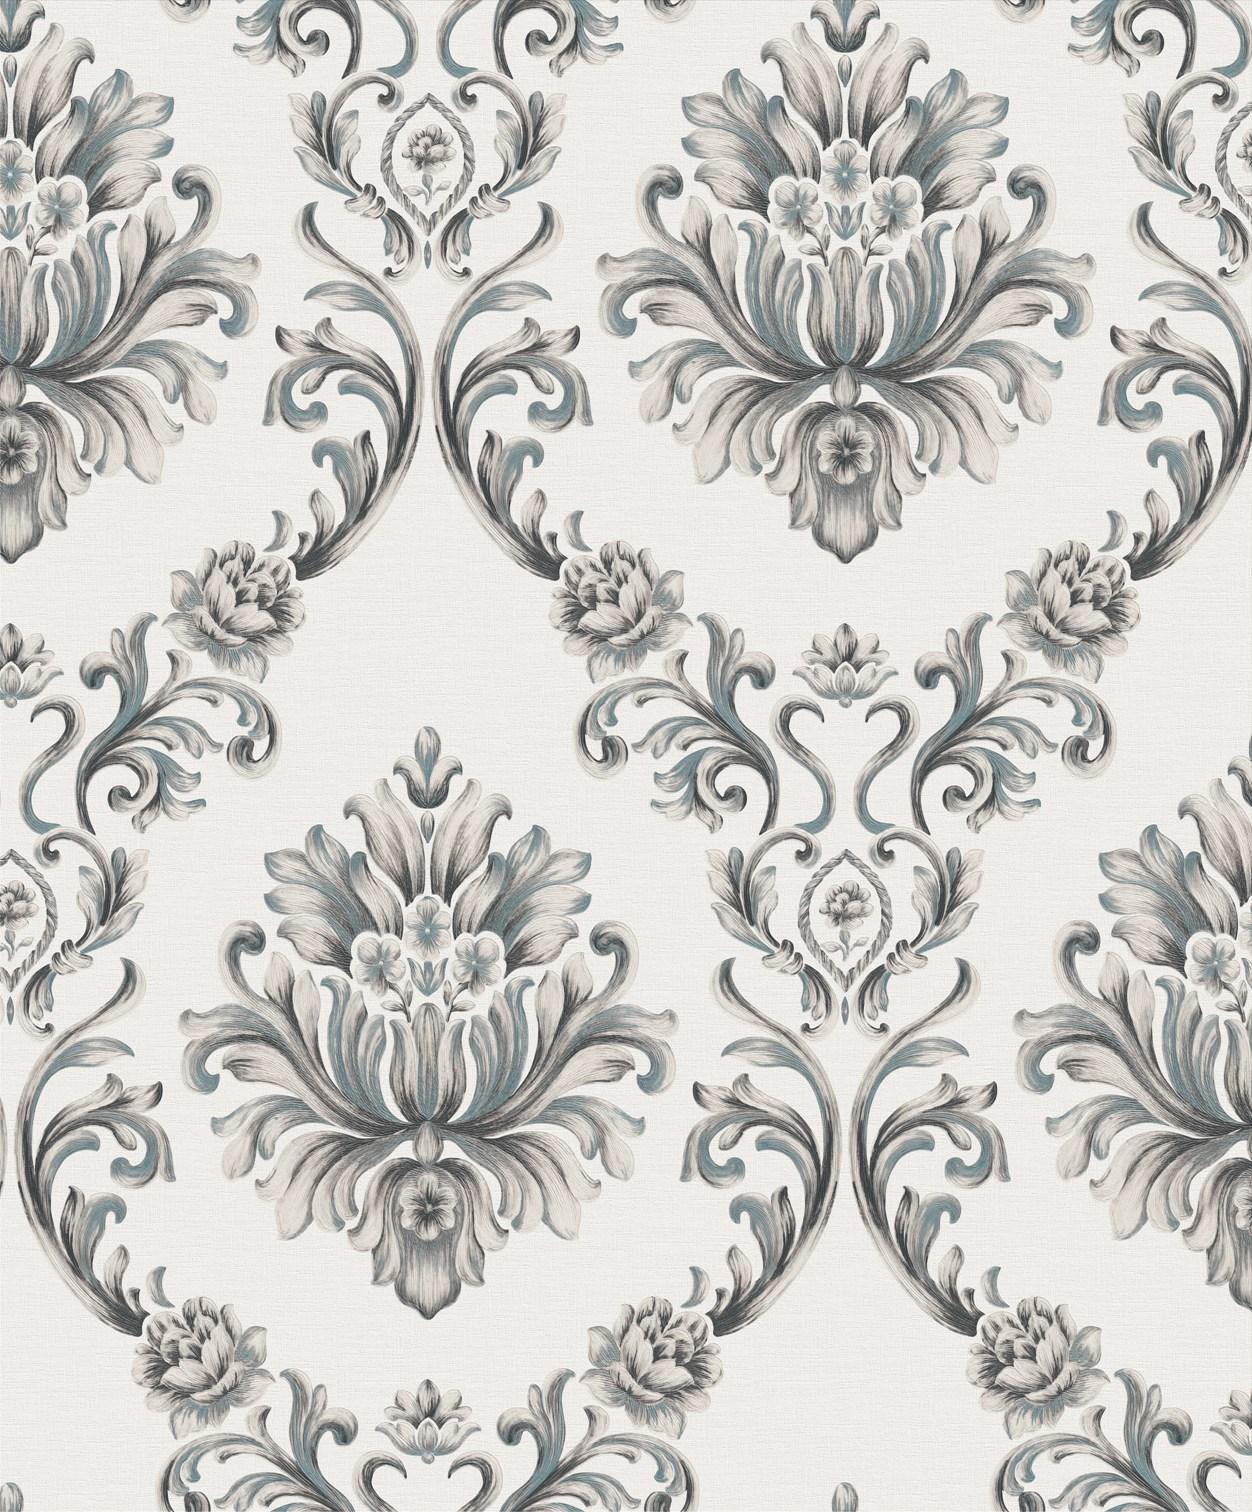 Grey And White Damask Wallpaper A22 14p11 Decor City